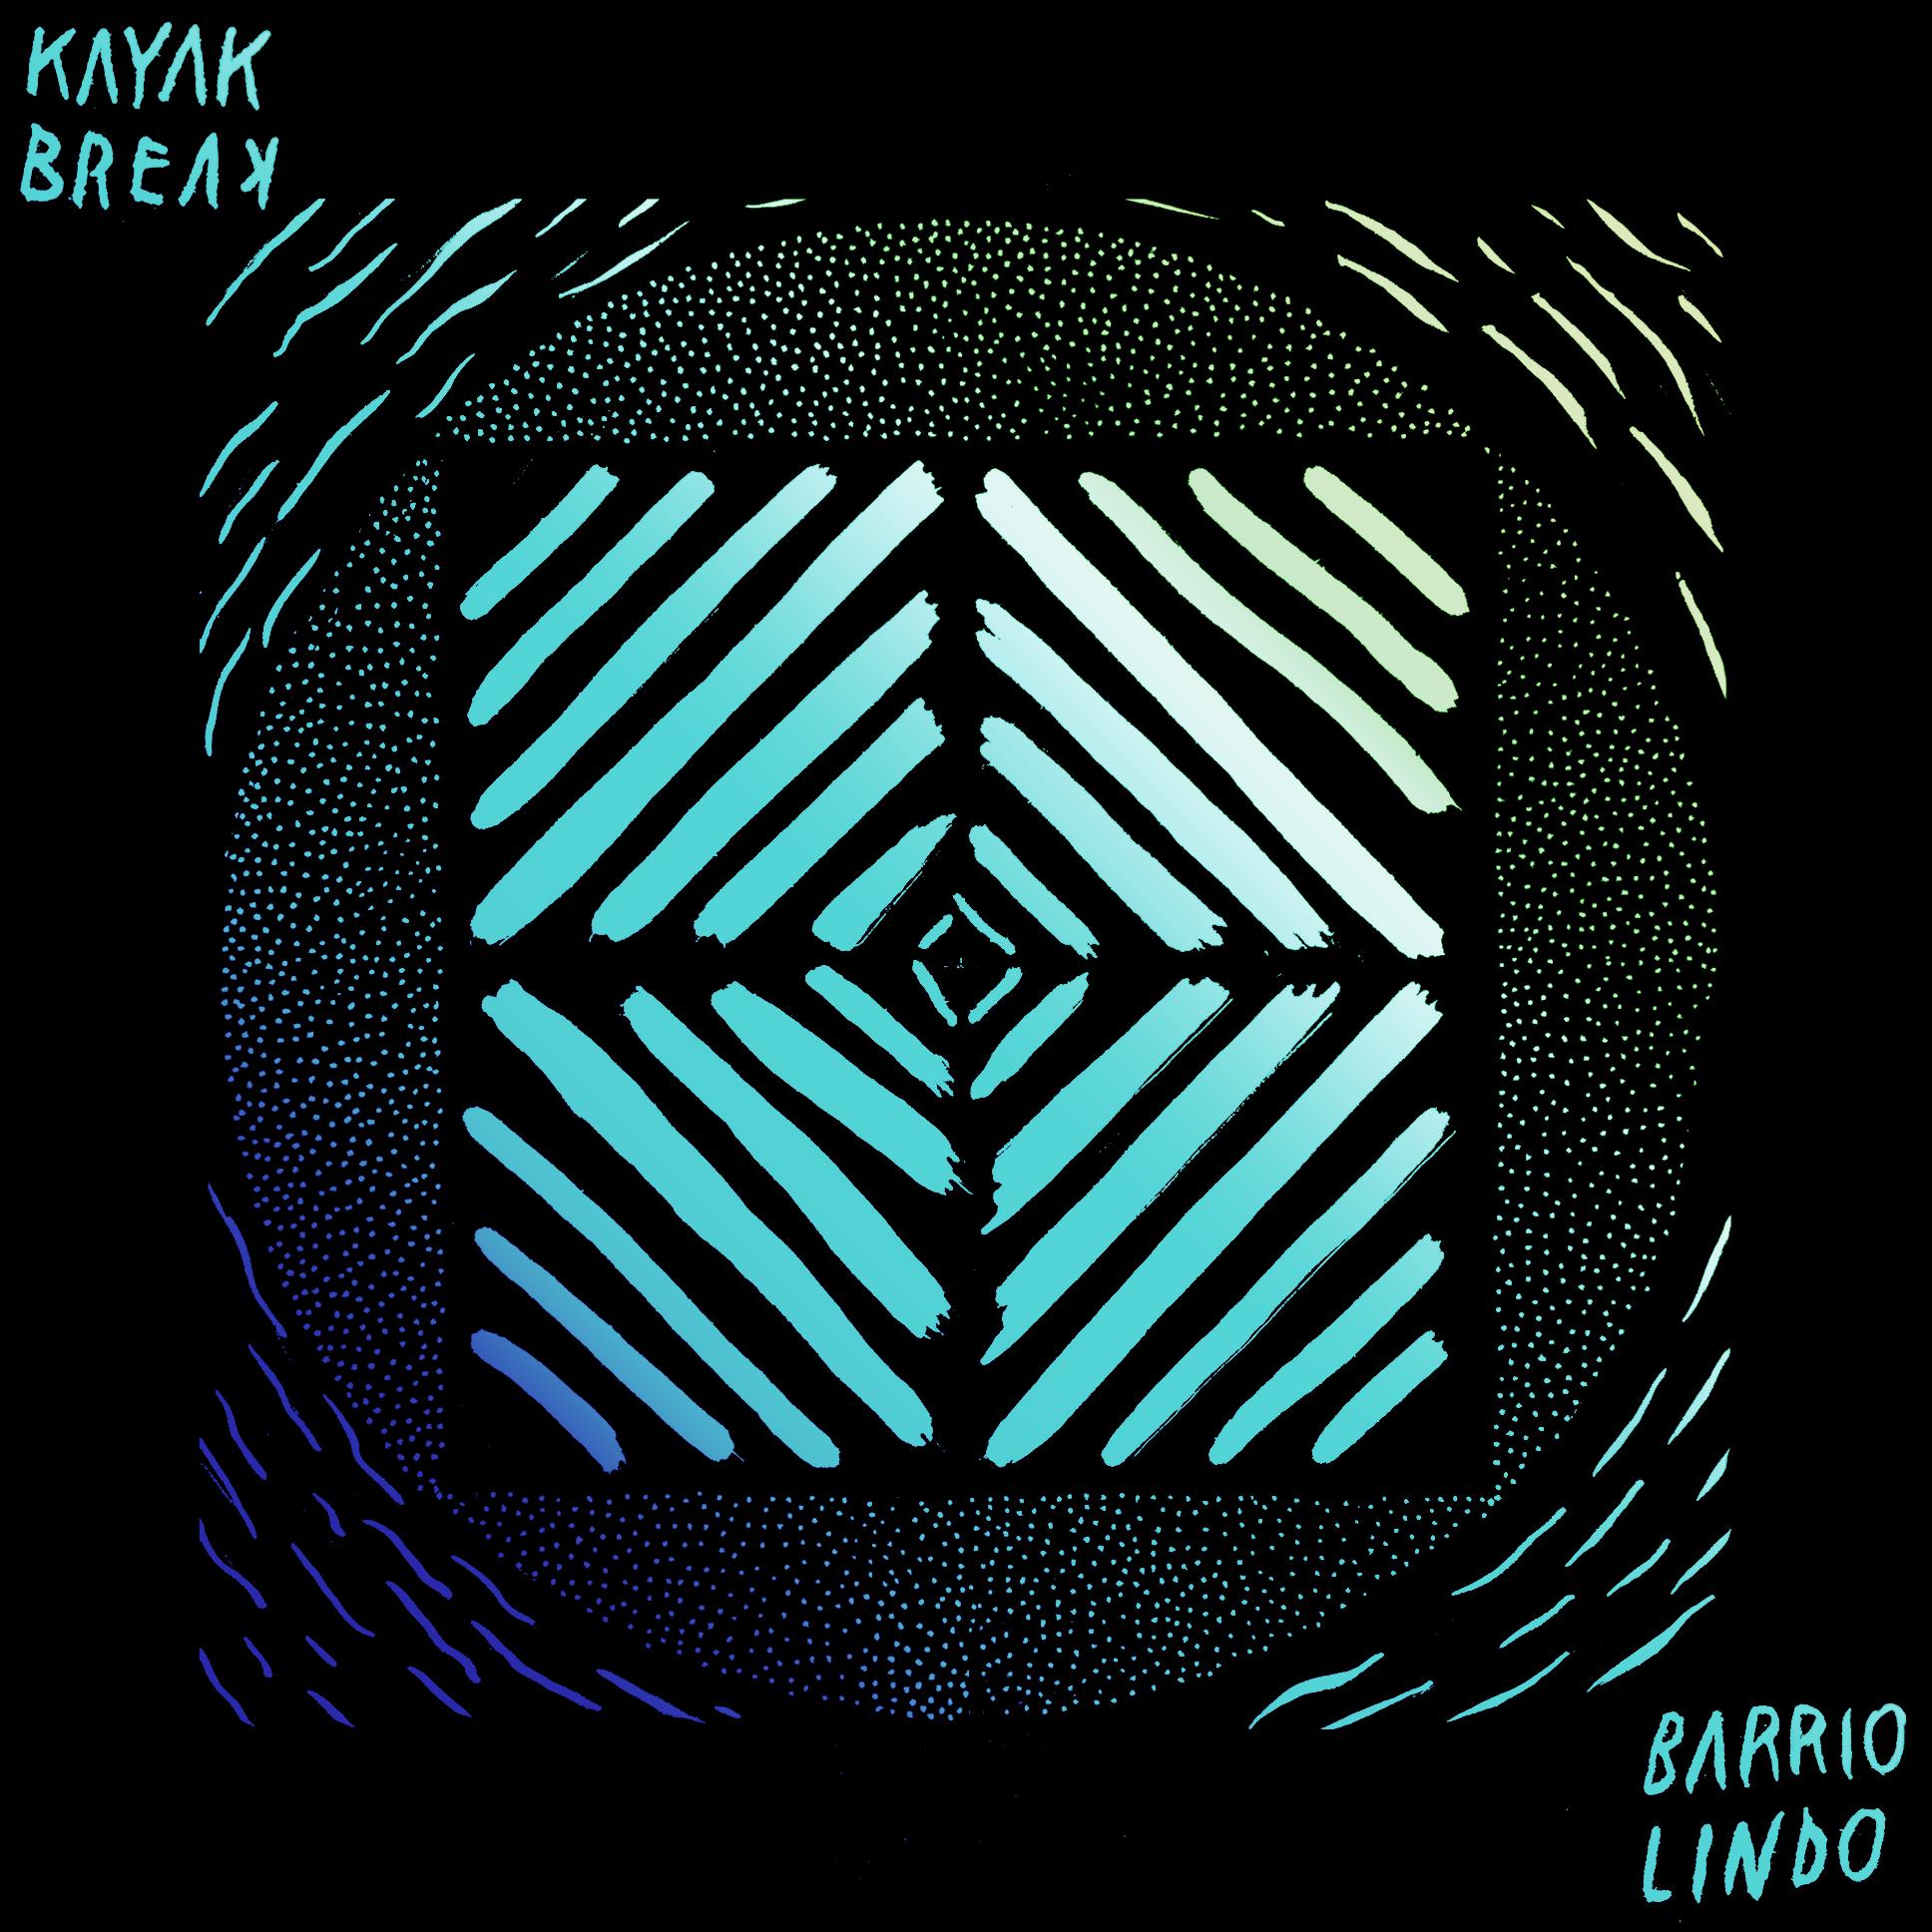 Barrio Lindo Sketches Nighttime Desert Soundscapes on His 'Kayak Break' EP